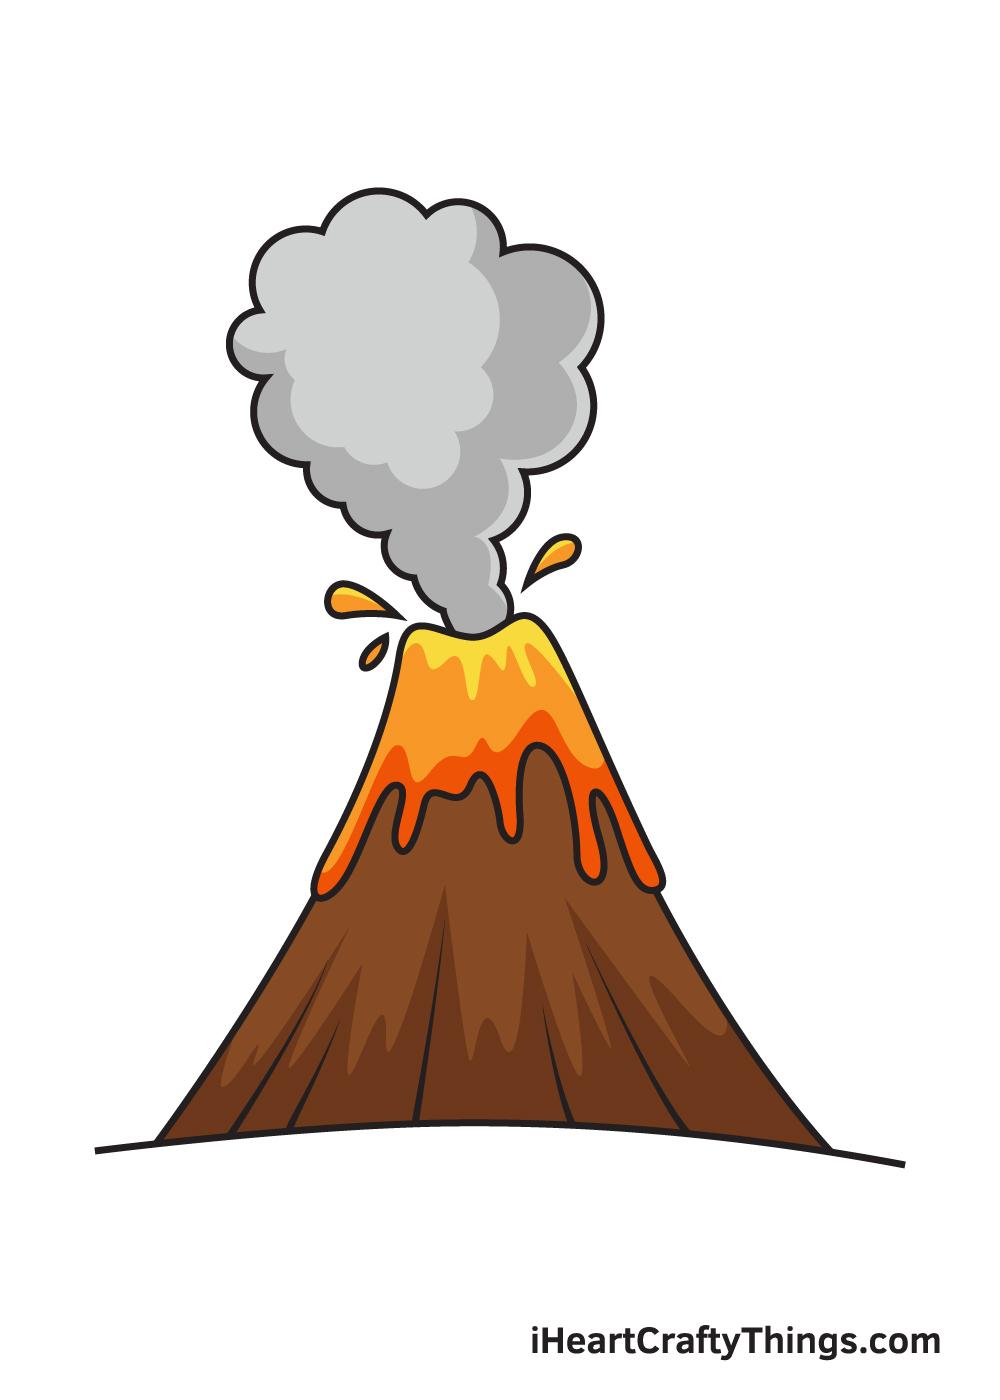 volcano drawing 9 steps